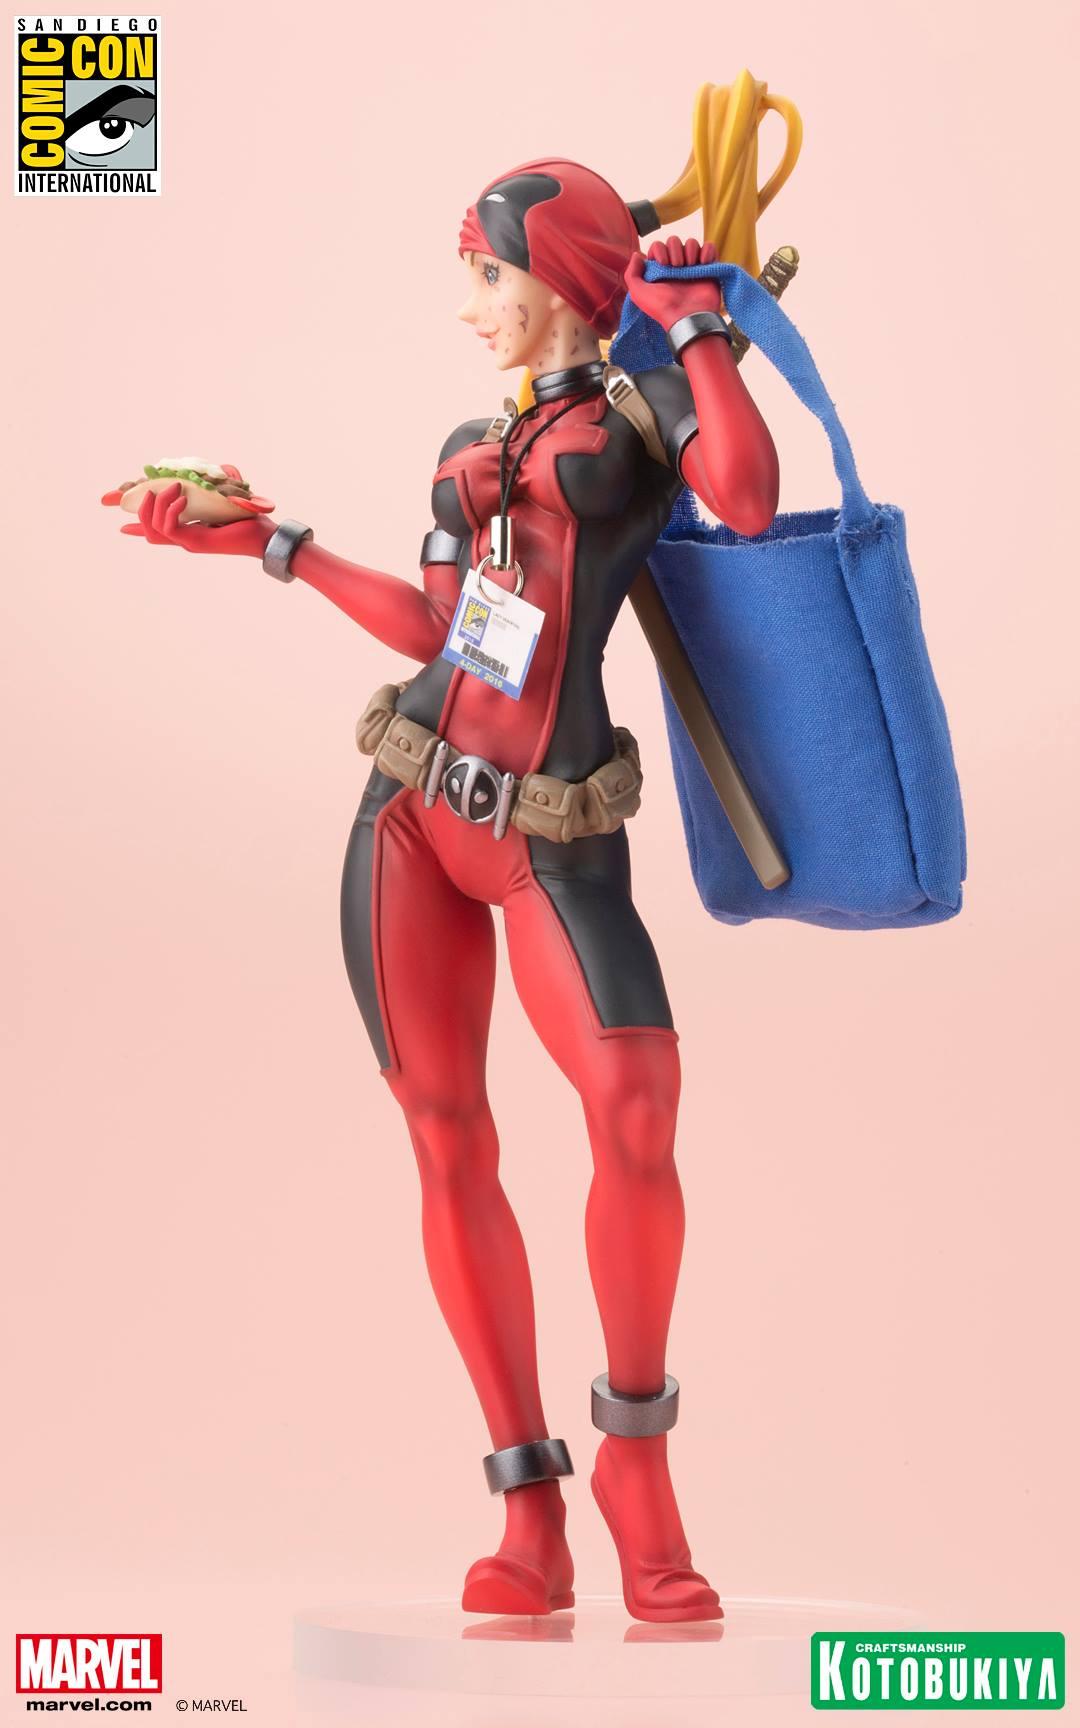 lady-deadpool-2016-sdcc-exclusive-bishoujo-statue-kotobukiya-marvel-7